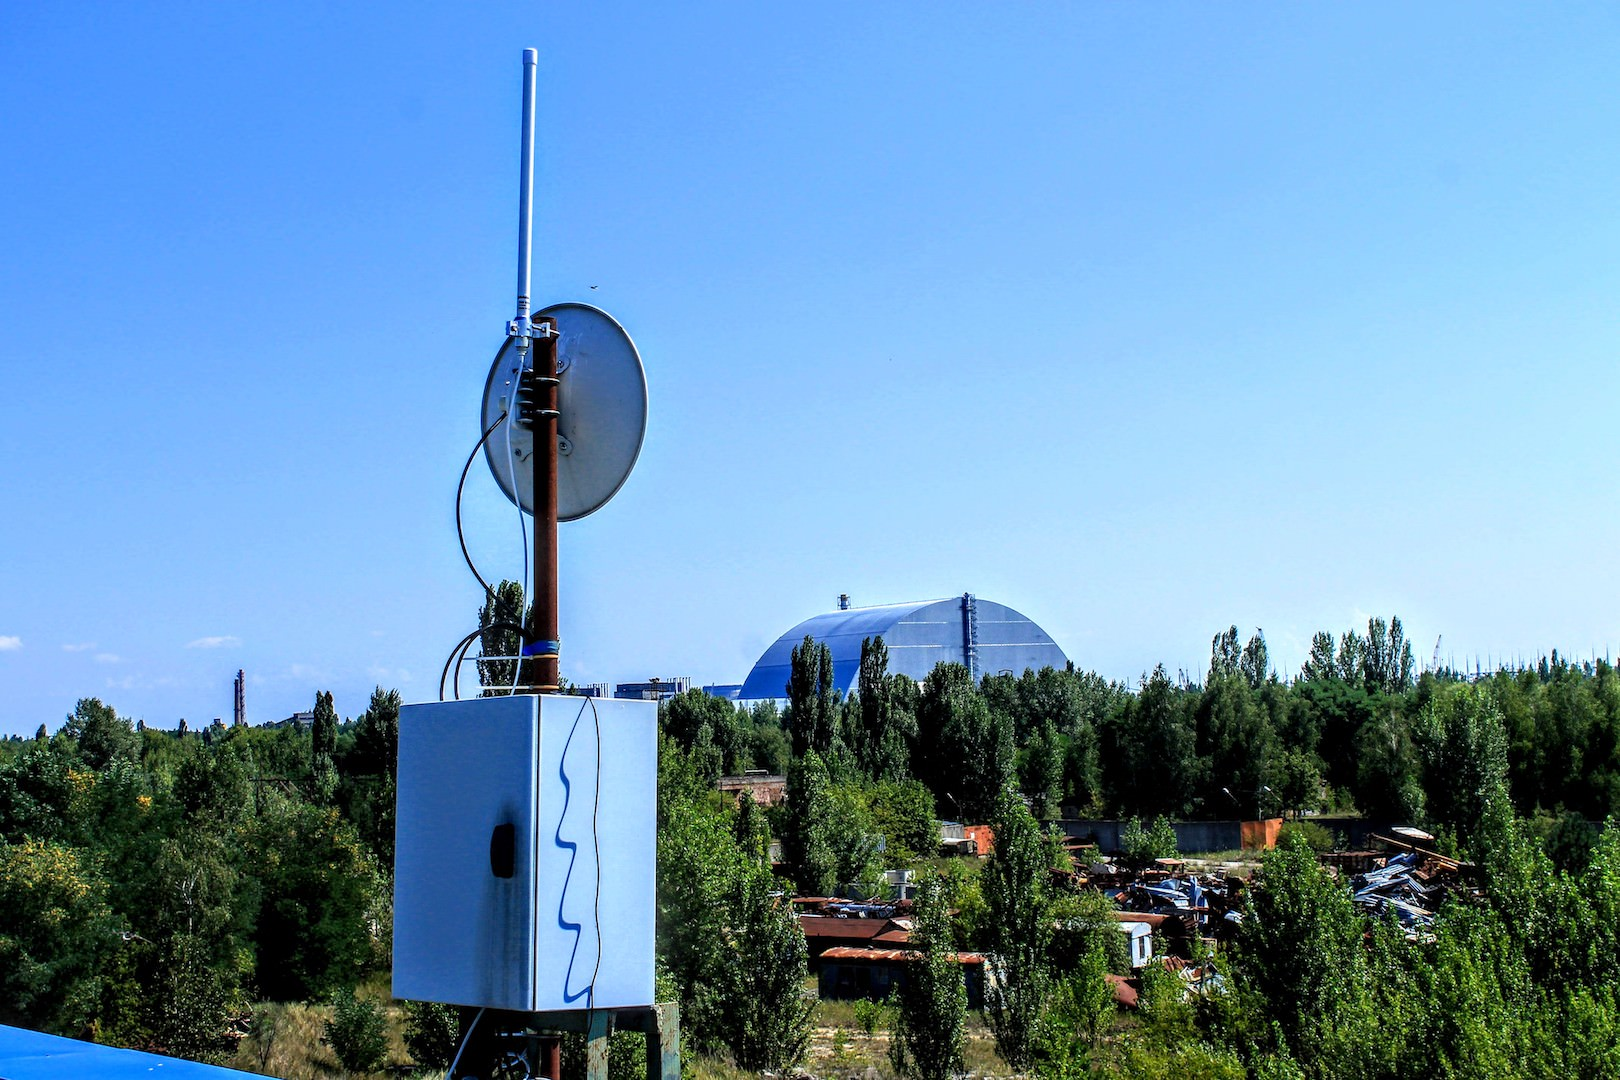 Our New Receiver Near Chernobyl | Flightradar24 Blog